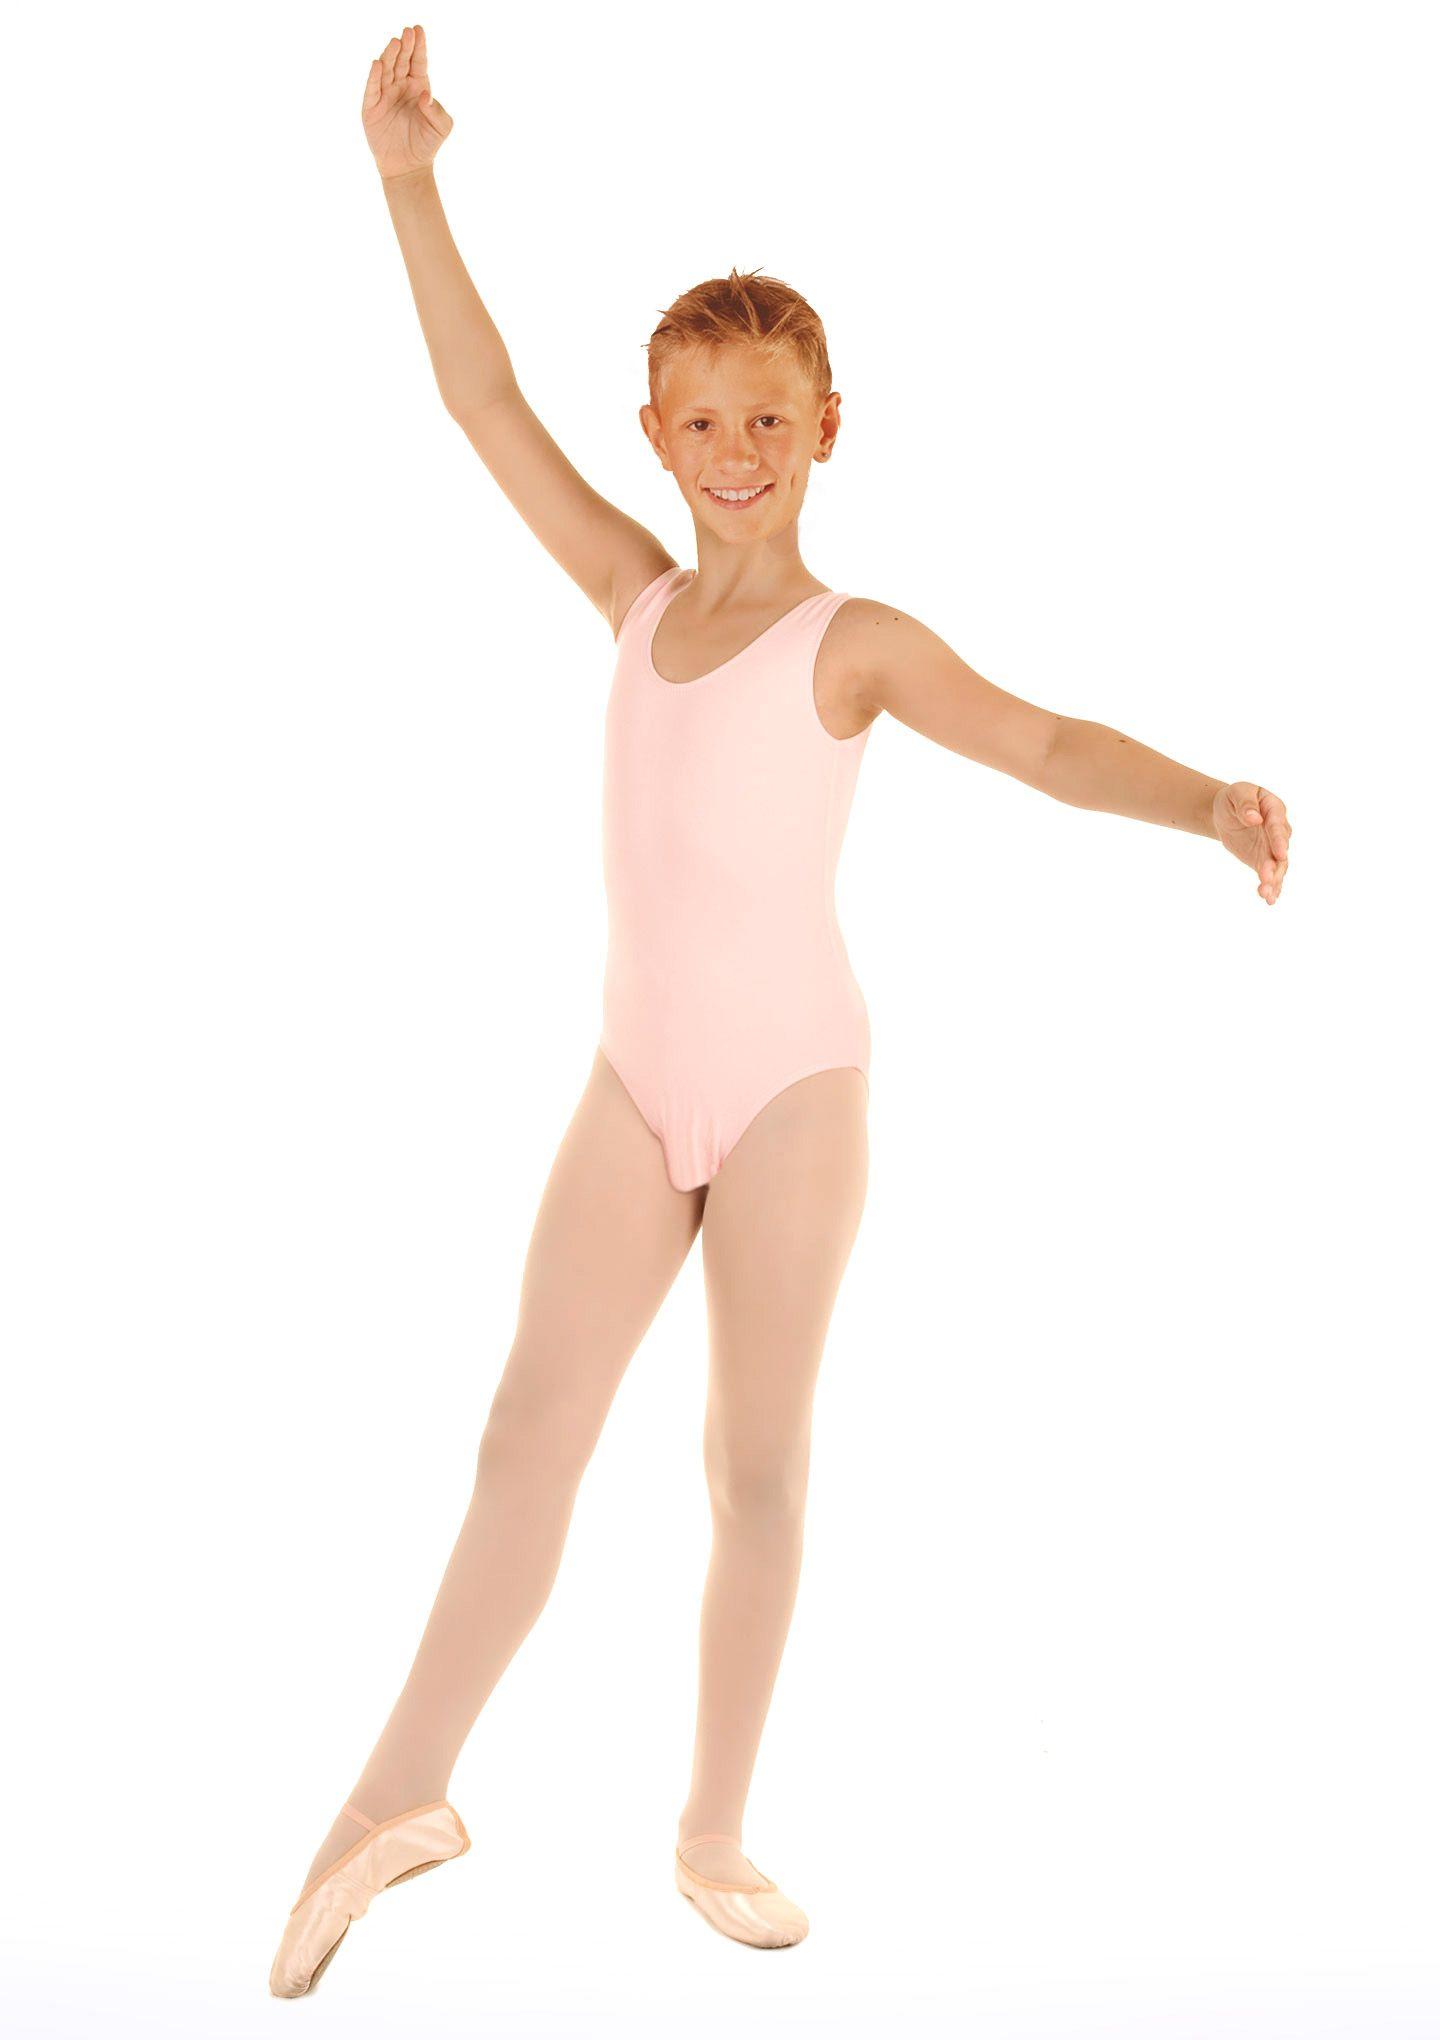 adb8f7df7bd0f Pin by En Pointe on Boys as Ballerinas in 2019 | Boys leotard, Boys wearing  skirts, Ballet girls